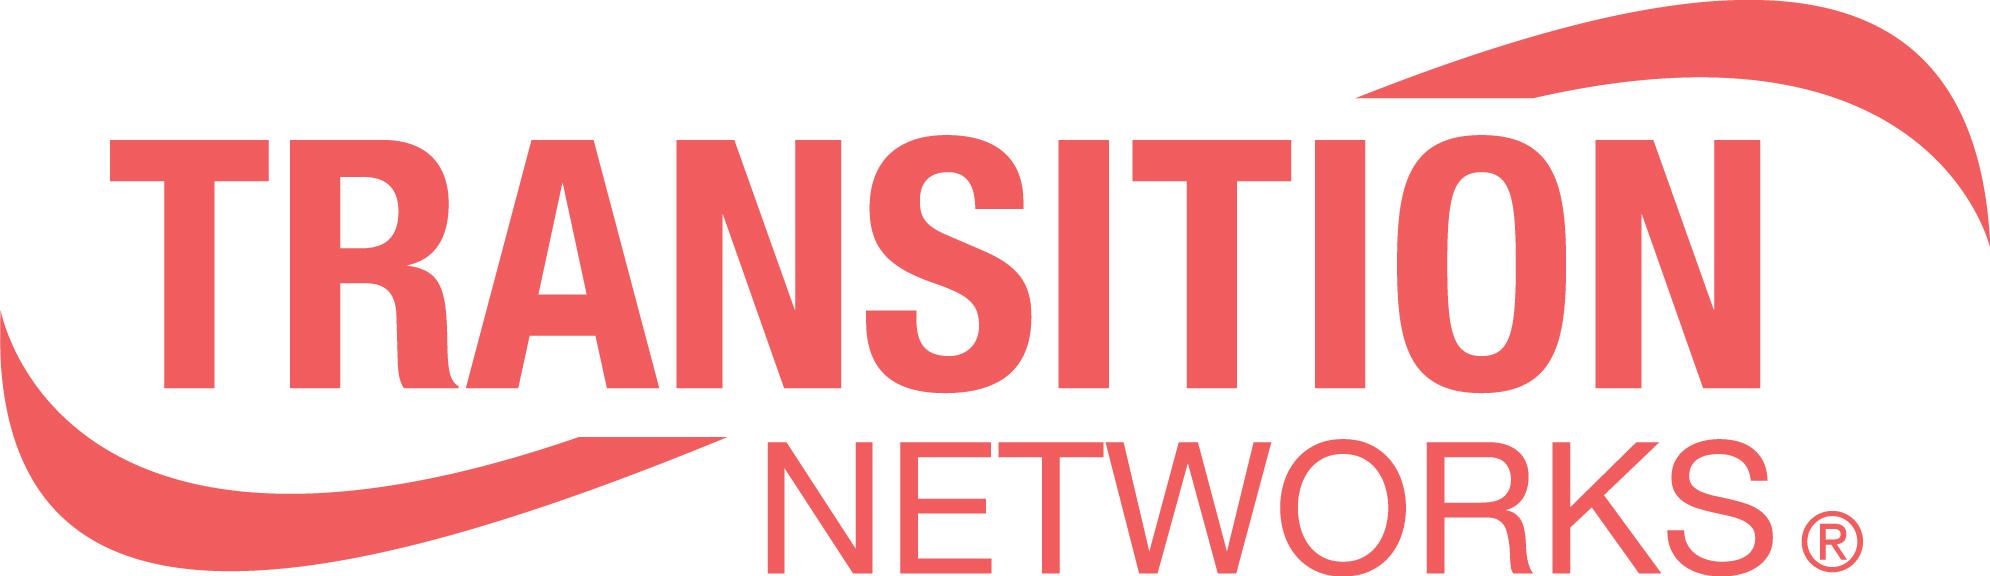 SFP (mini-GBIC) transceiver module - Gigabit Ethernet - 1000Base-BX - LC single-mode - up to 24.9 miles - 1310 (TX) / 1490 (RX) nm